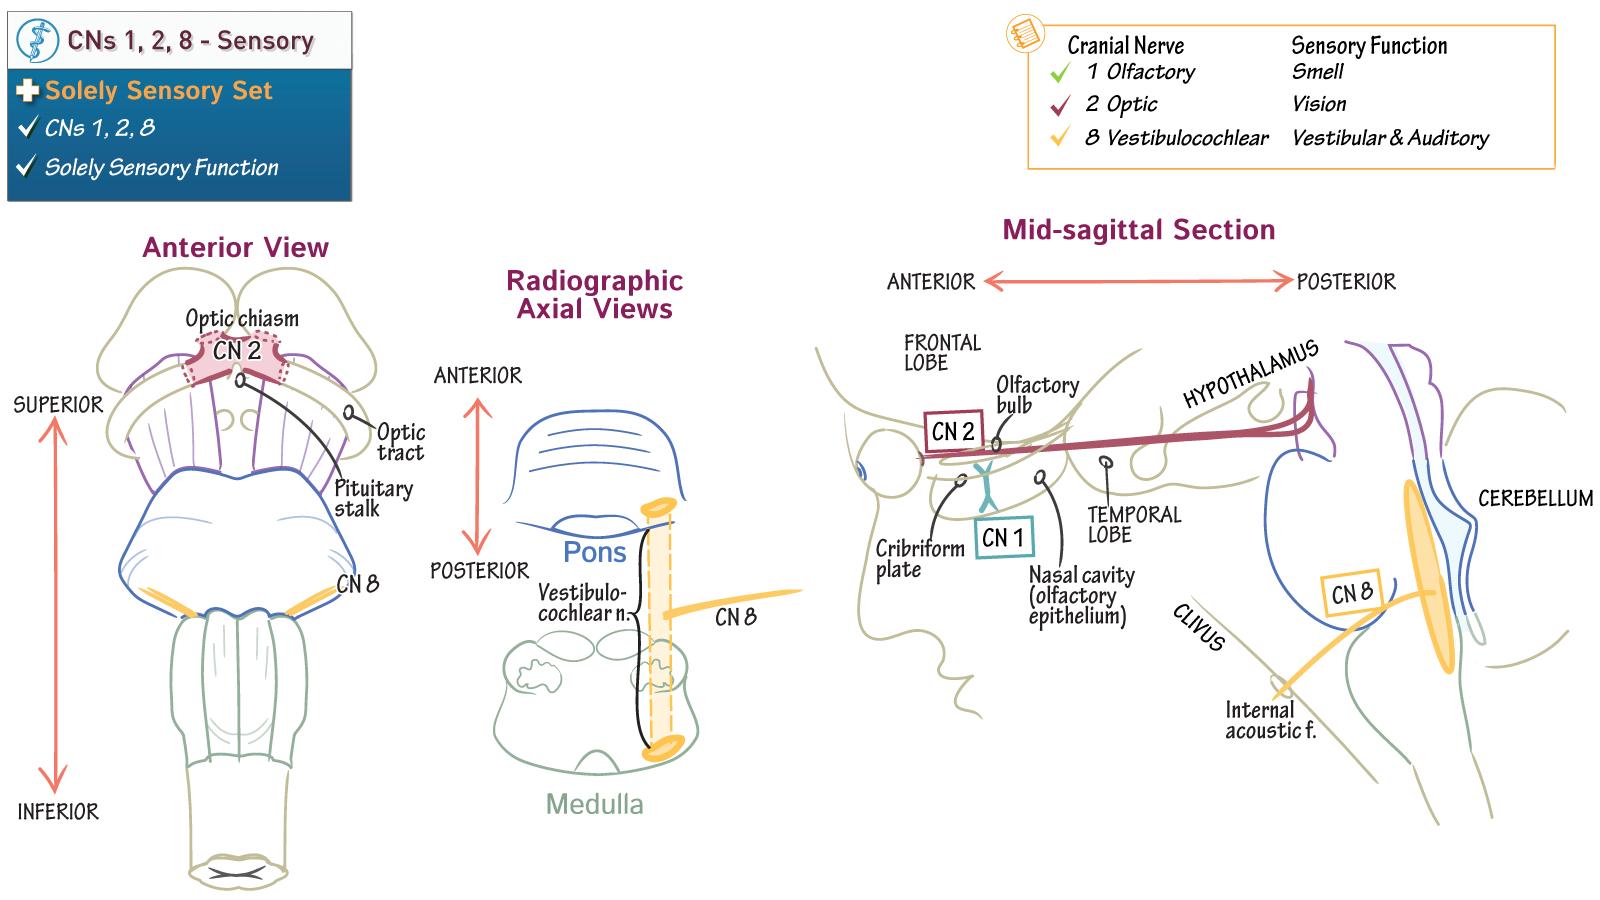 Neurosciences Abpn Neurology Boards Cns 1 2 8 Solely Sensory